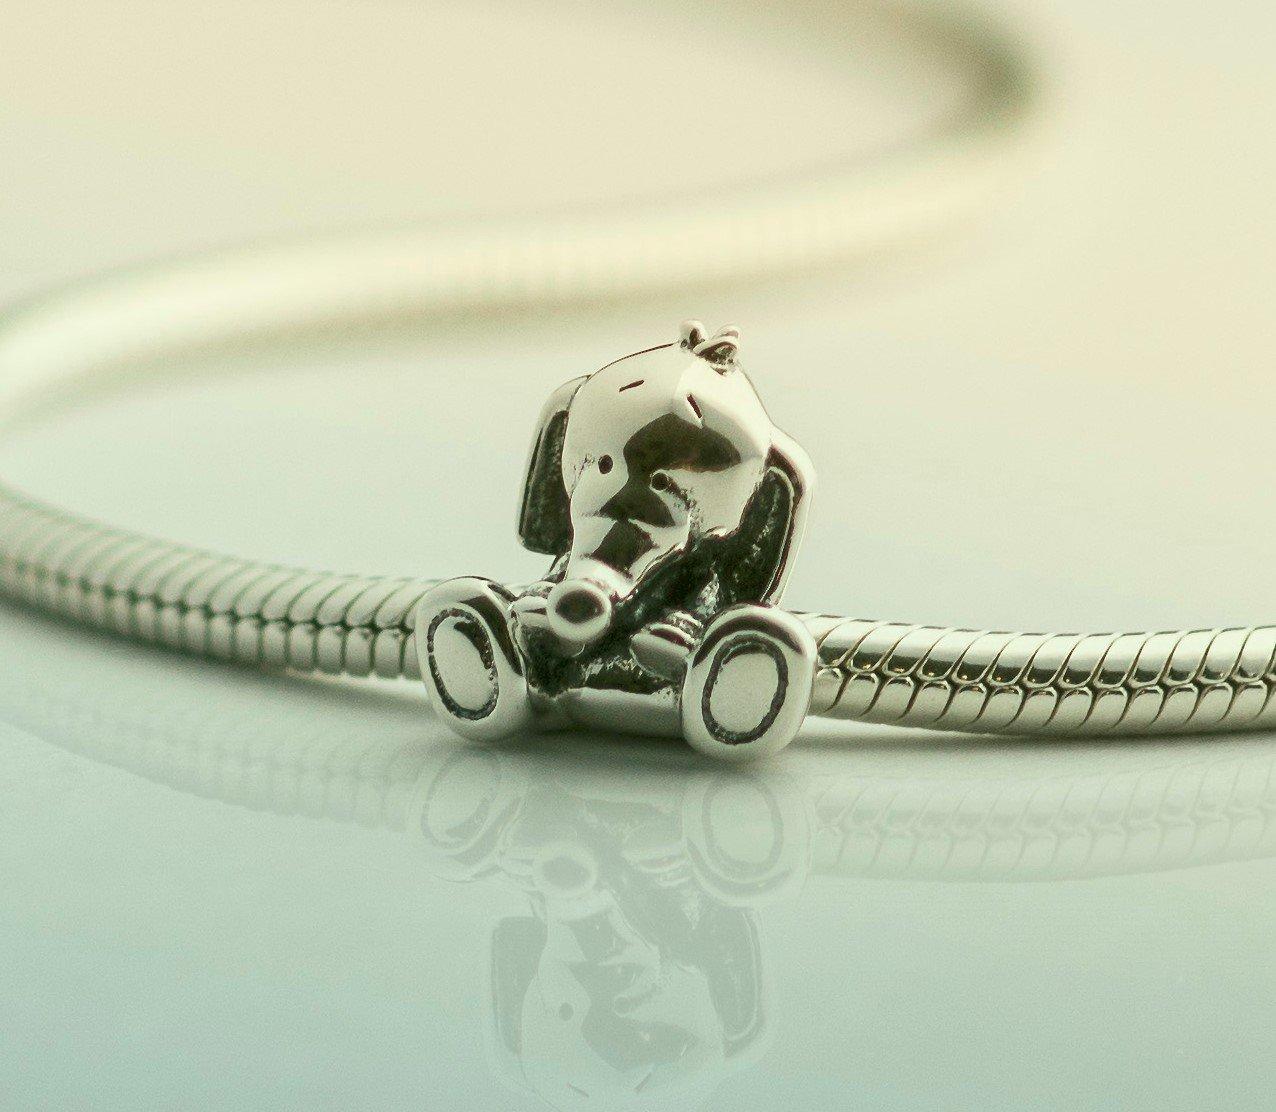 e684073fa NEW - Cute Baby Elephant Bamboo Sterling Silver Charm Bead S925, Cute Lucky  Elephant Silver Charm Bead Pendant, Silver Baby Elephant Necklace, ...